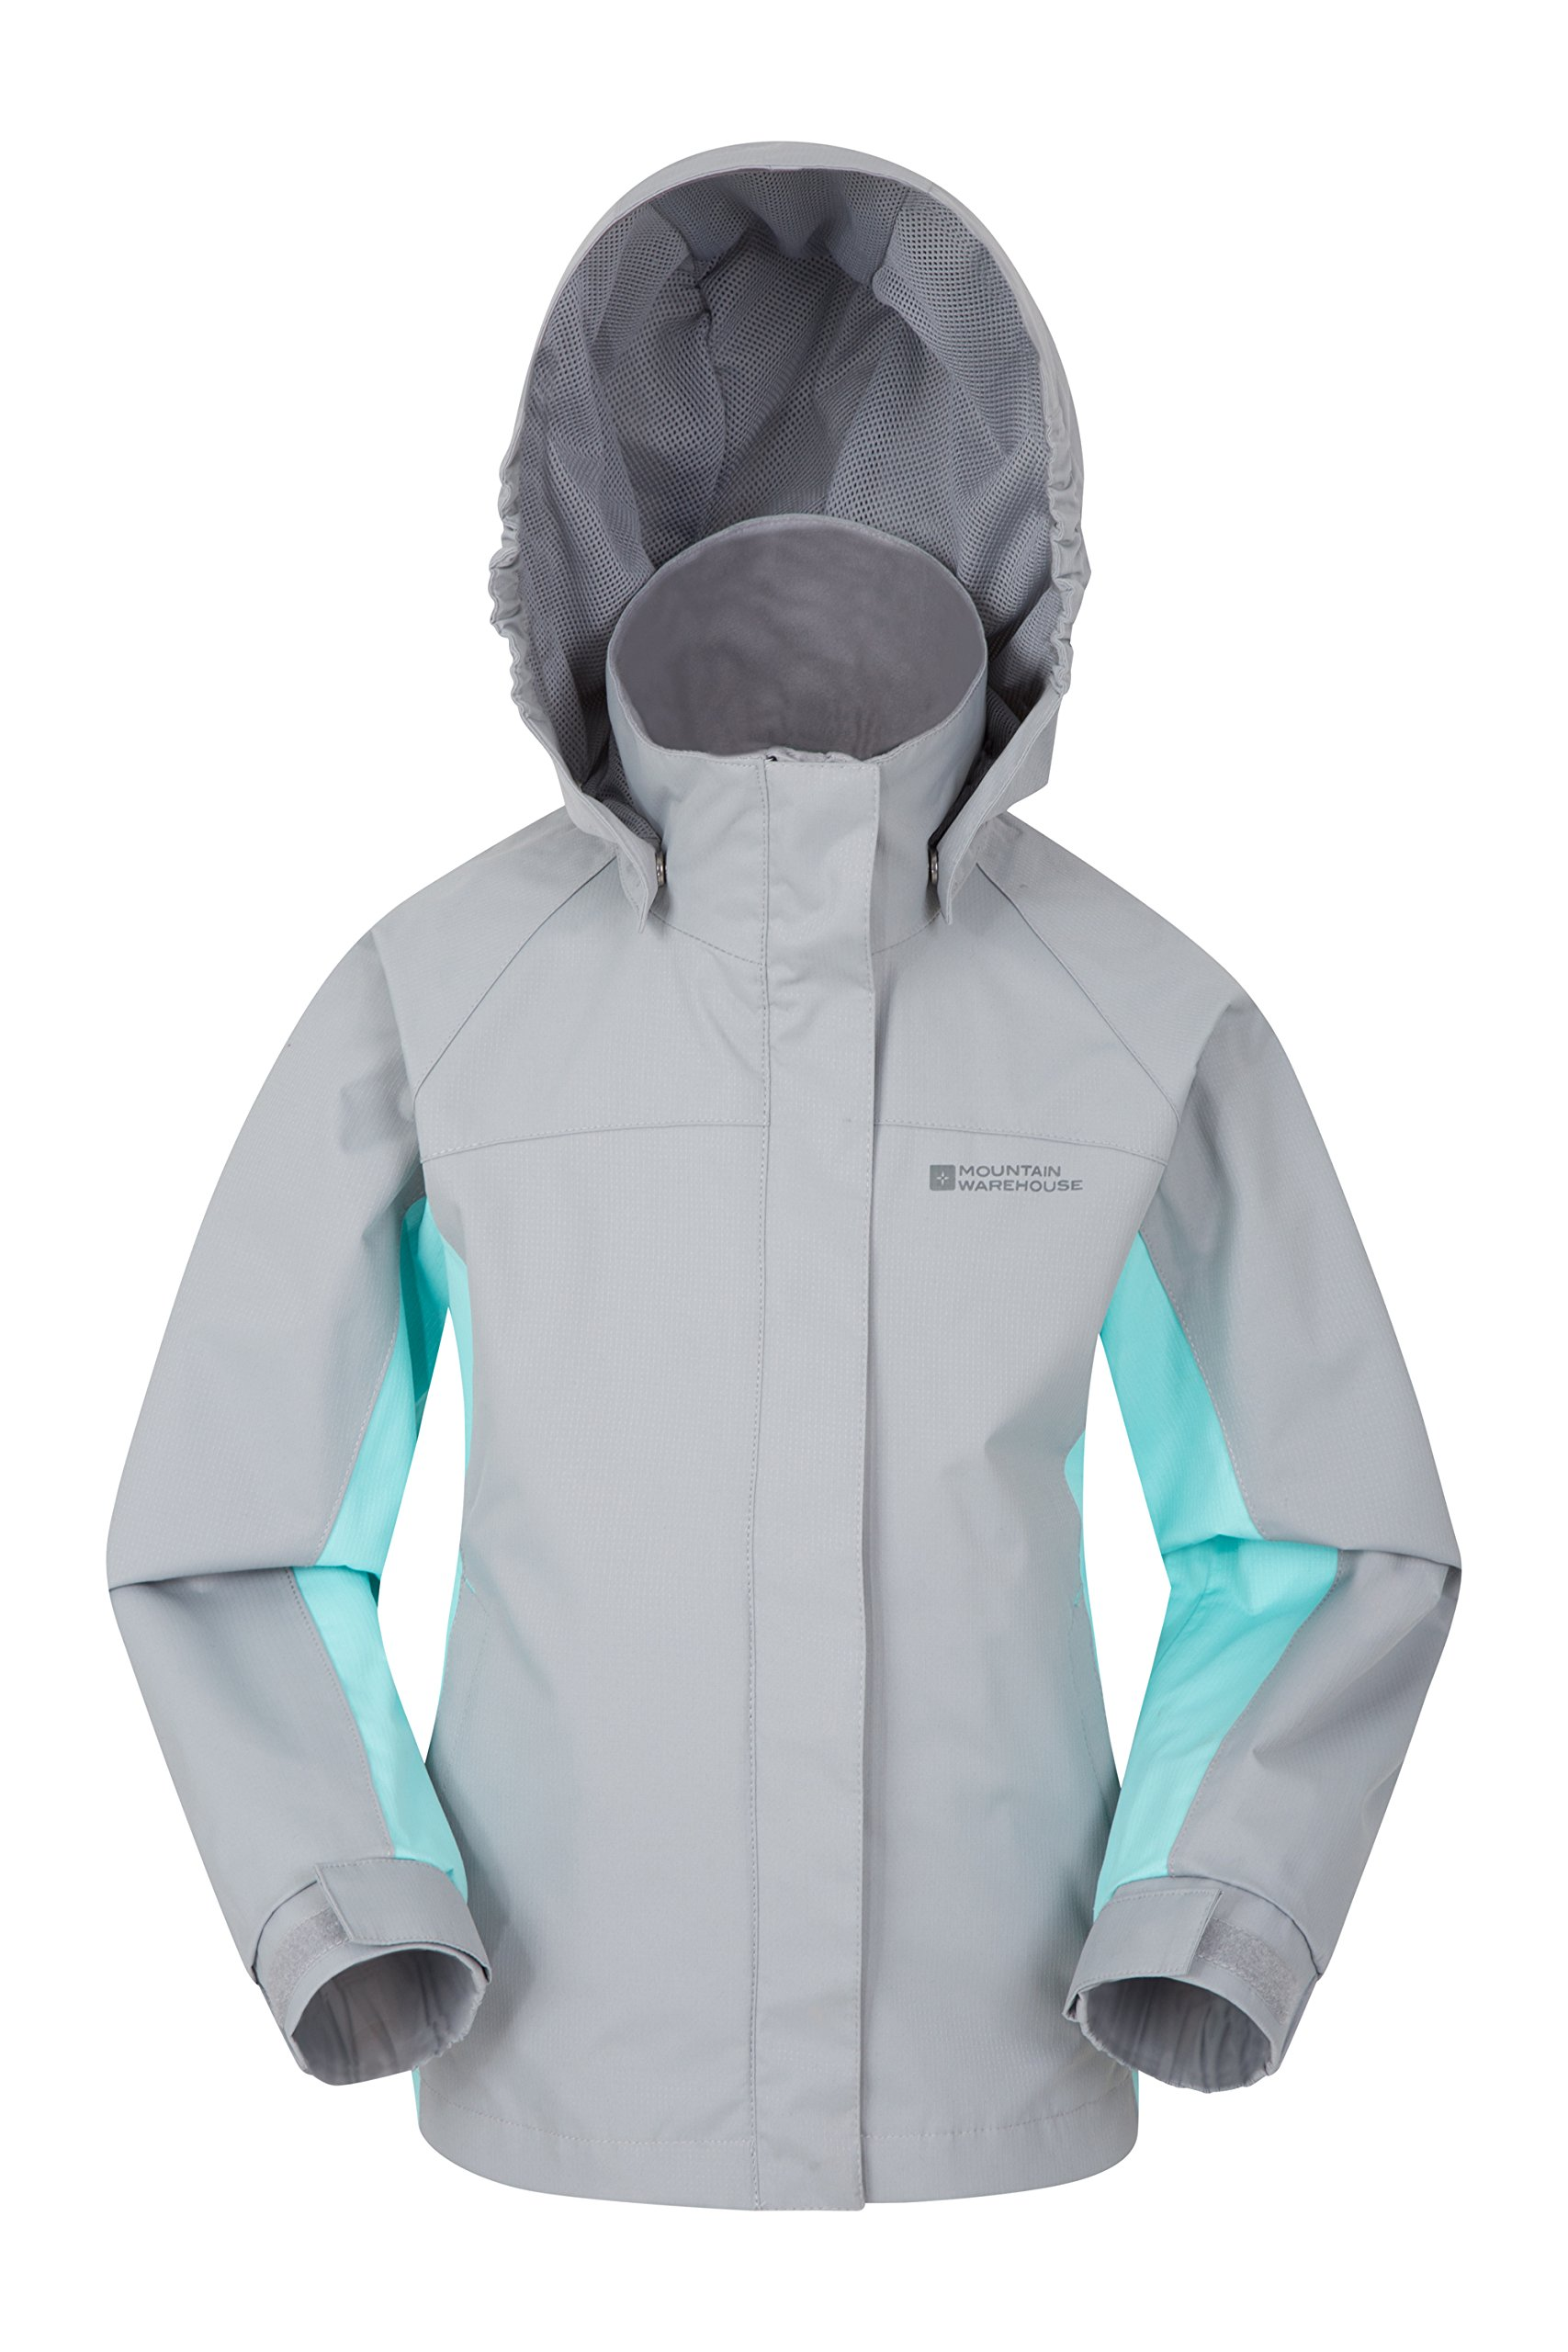 Mountain Warehouse Shelly II Kids Jacket - Waterproof Summer Coat Light Grey 9-10 Years